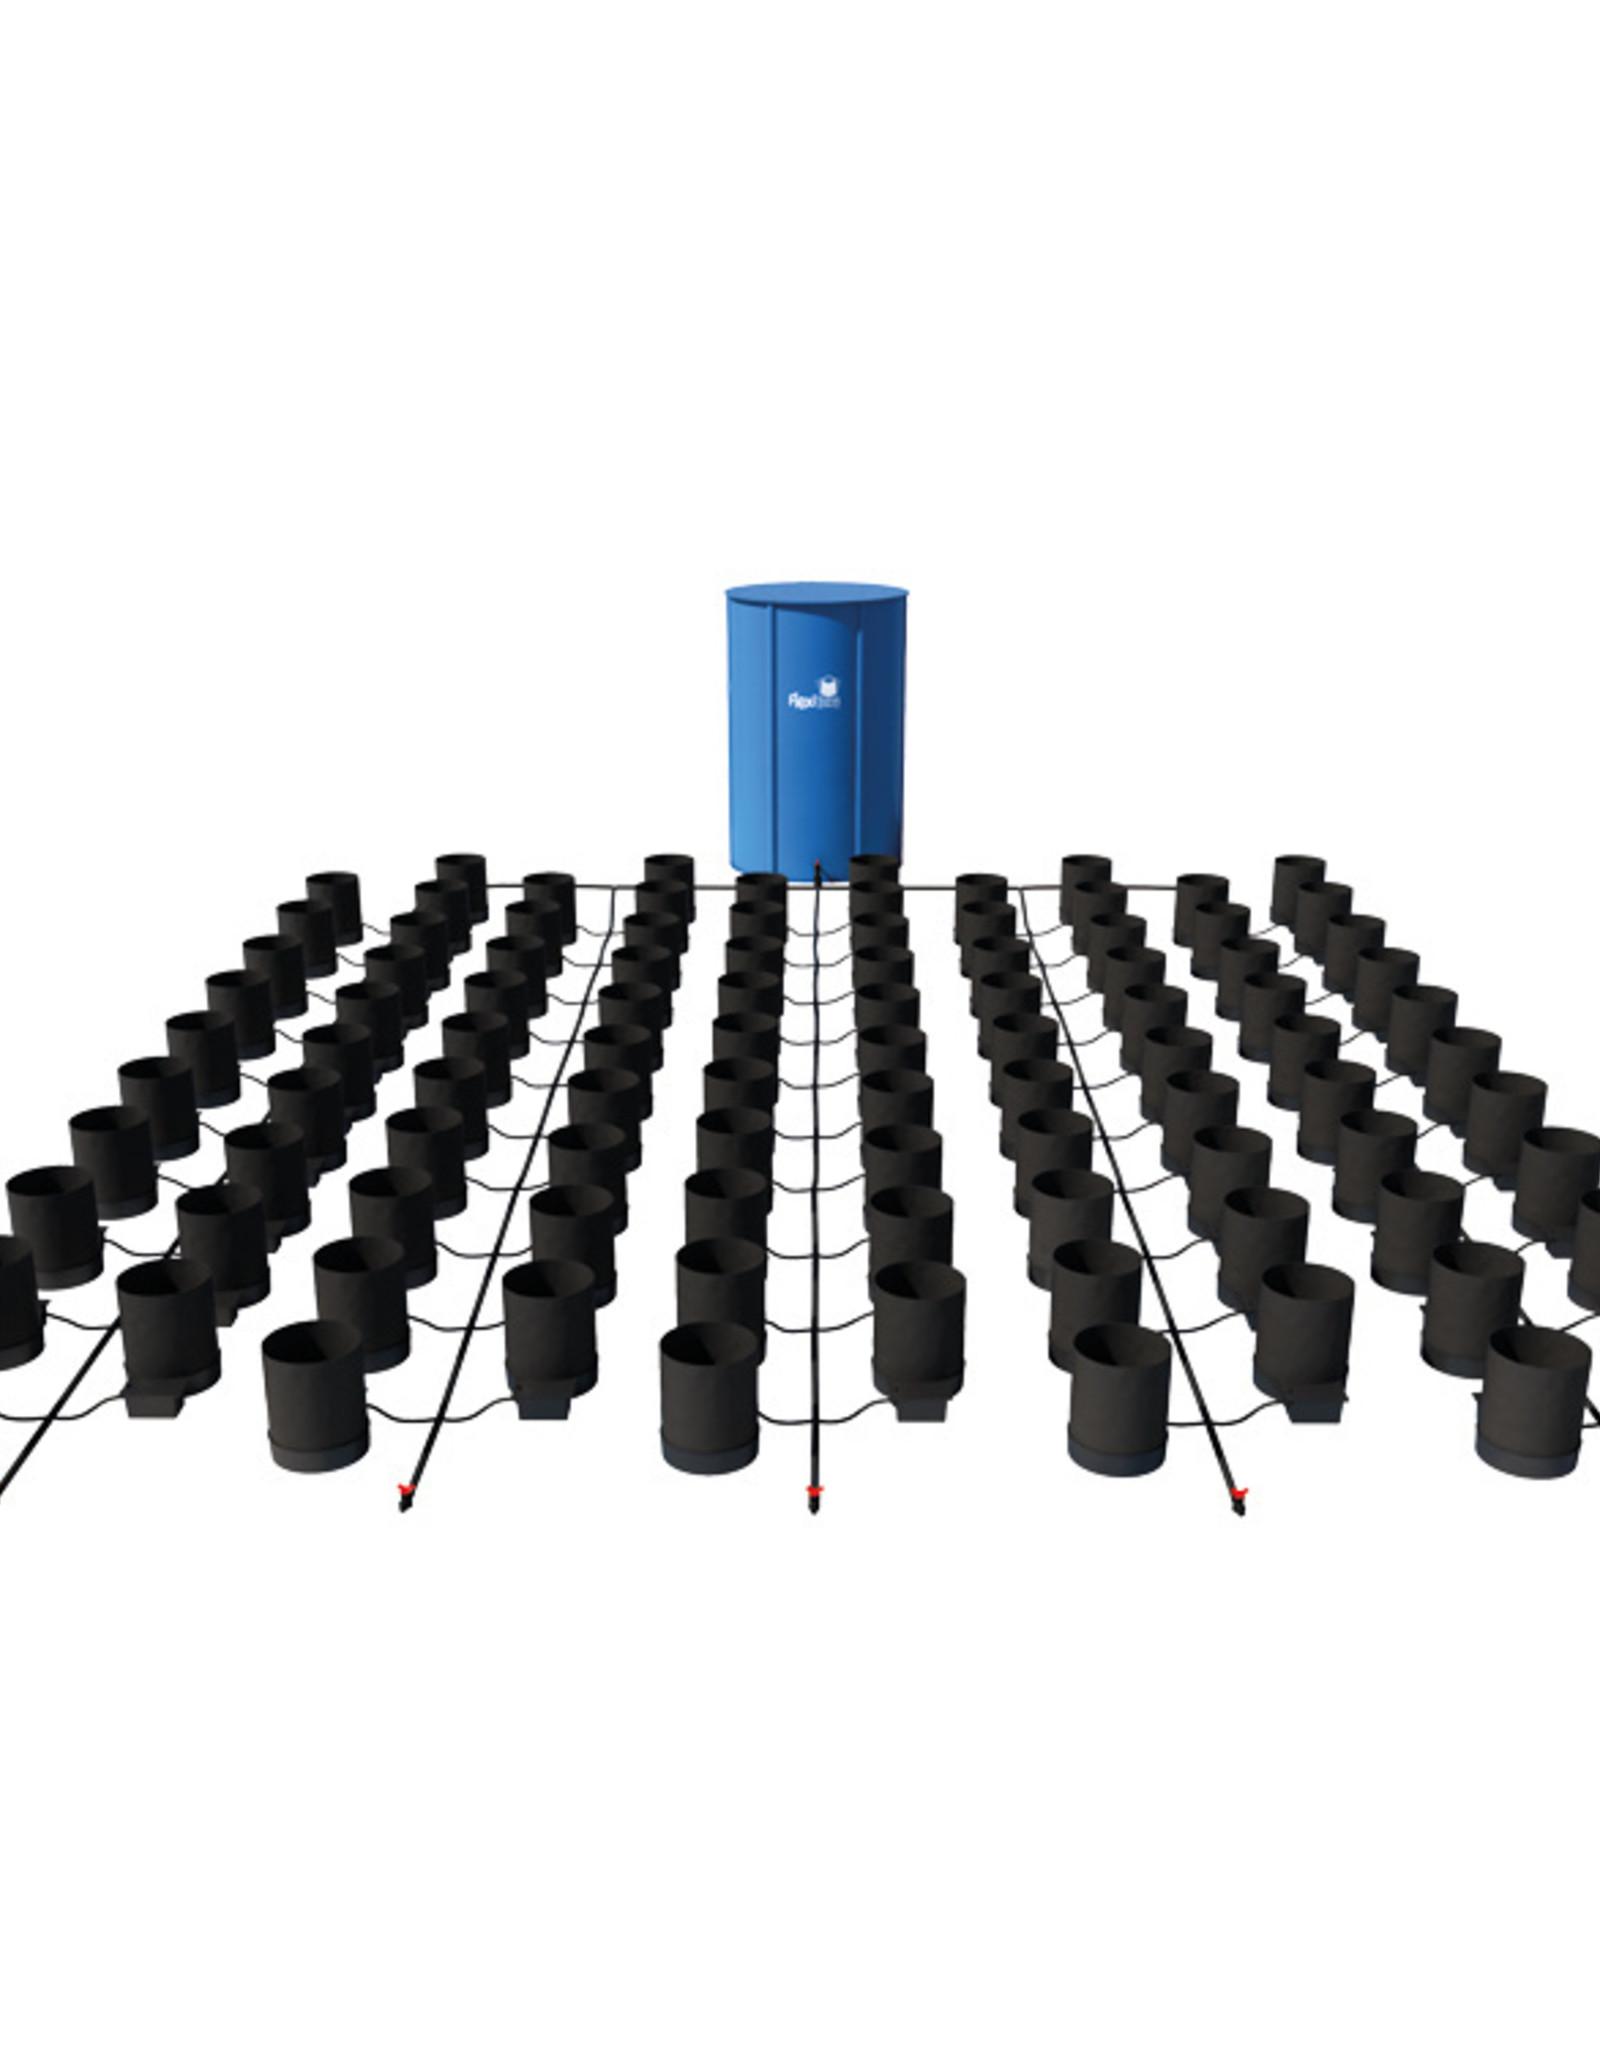 Autopot SmartPot 100 System